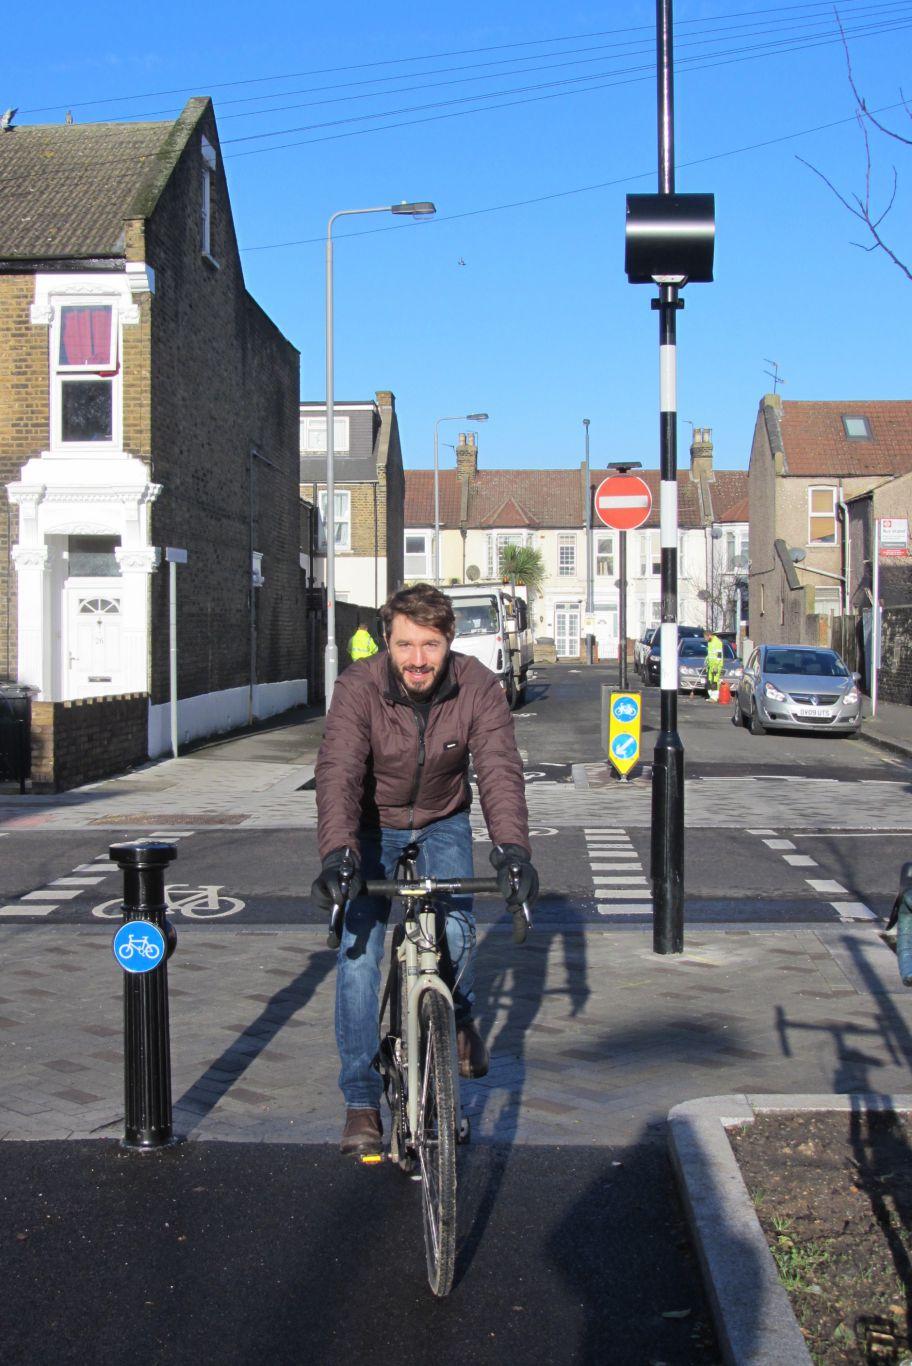 Man cycling towards camera